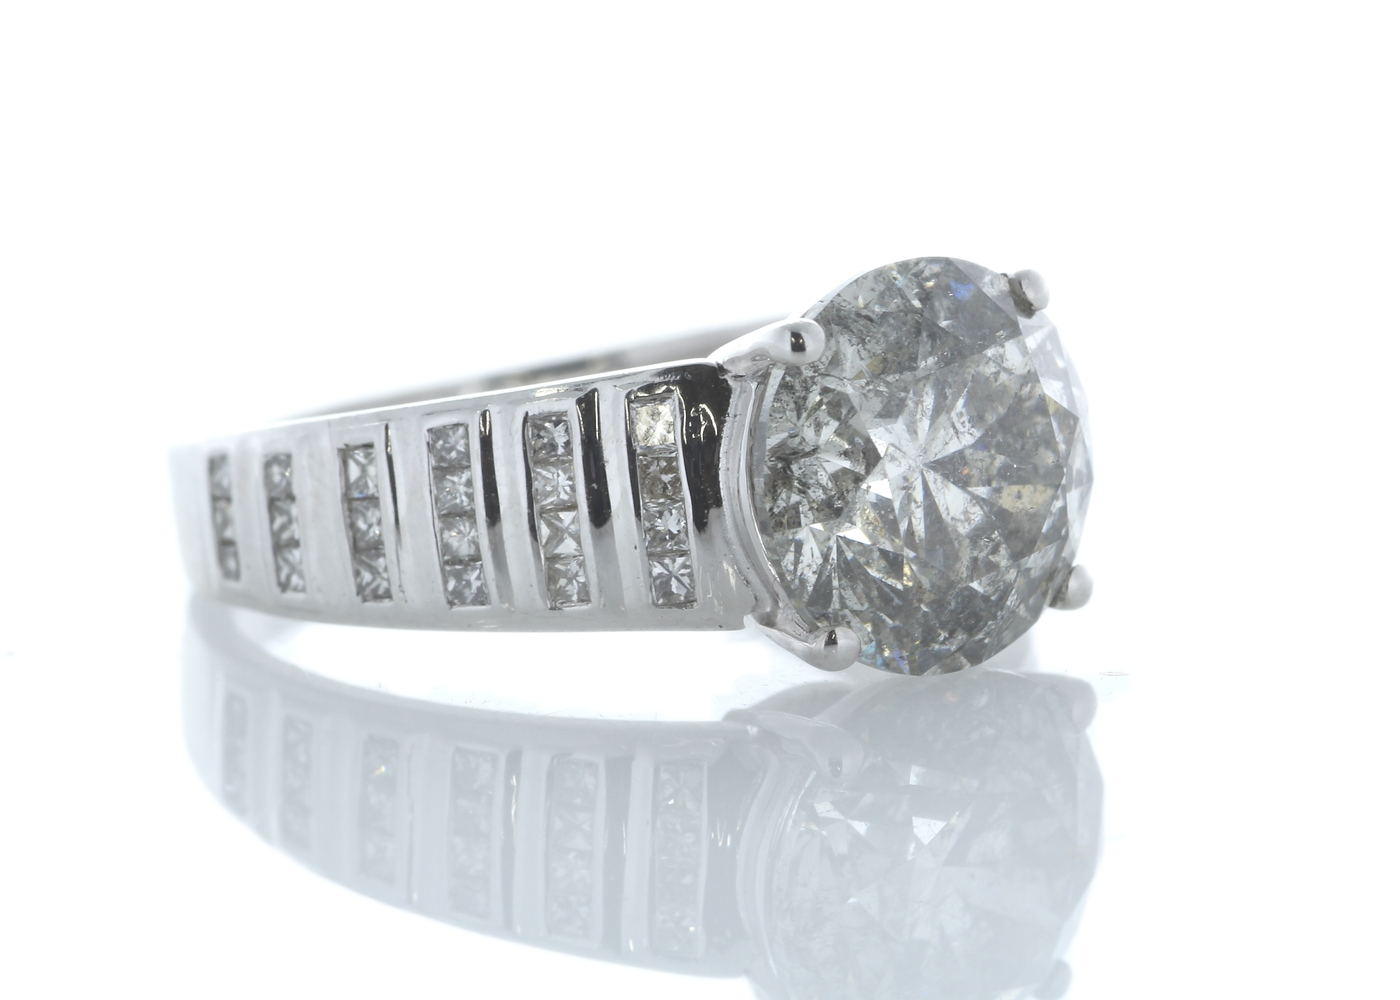 18ct White Gold Single Stone Prong Set With Stone Set Shoulders Diamond Ring 4.65 Carats - Image 2 of 5